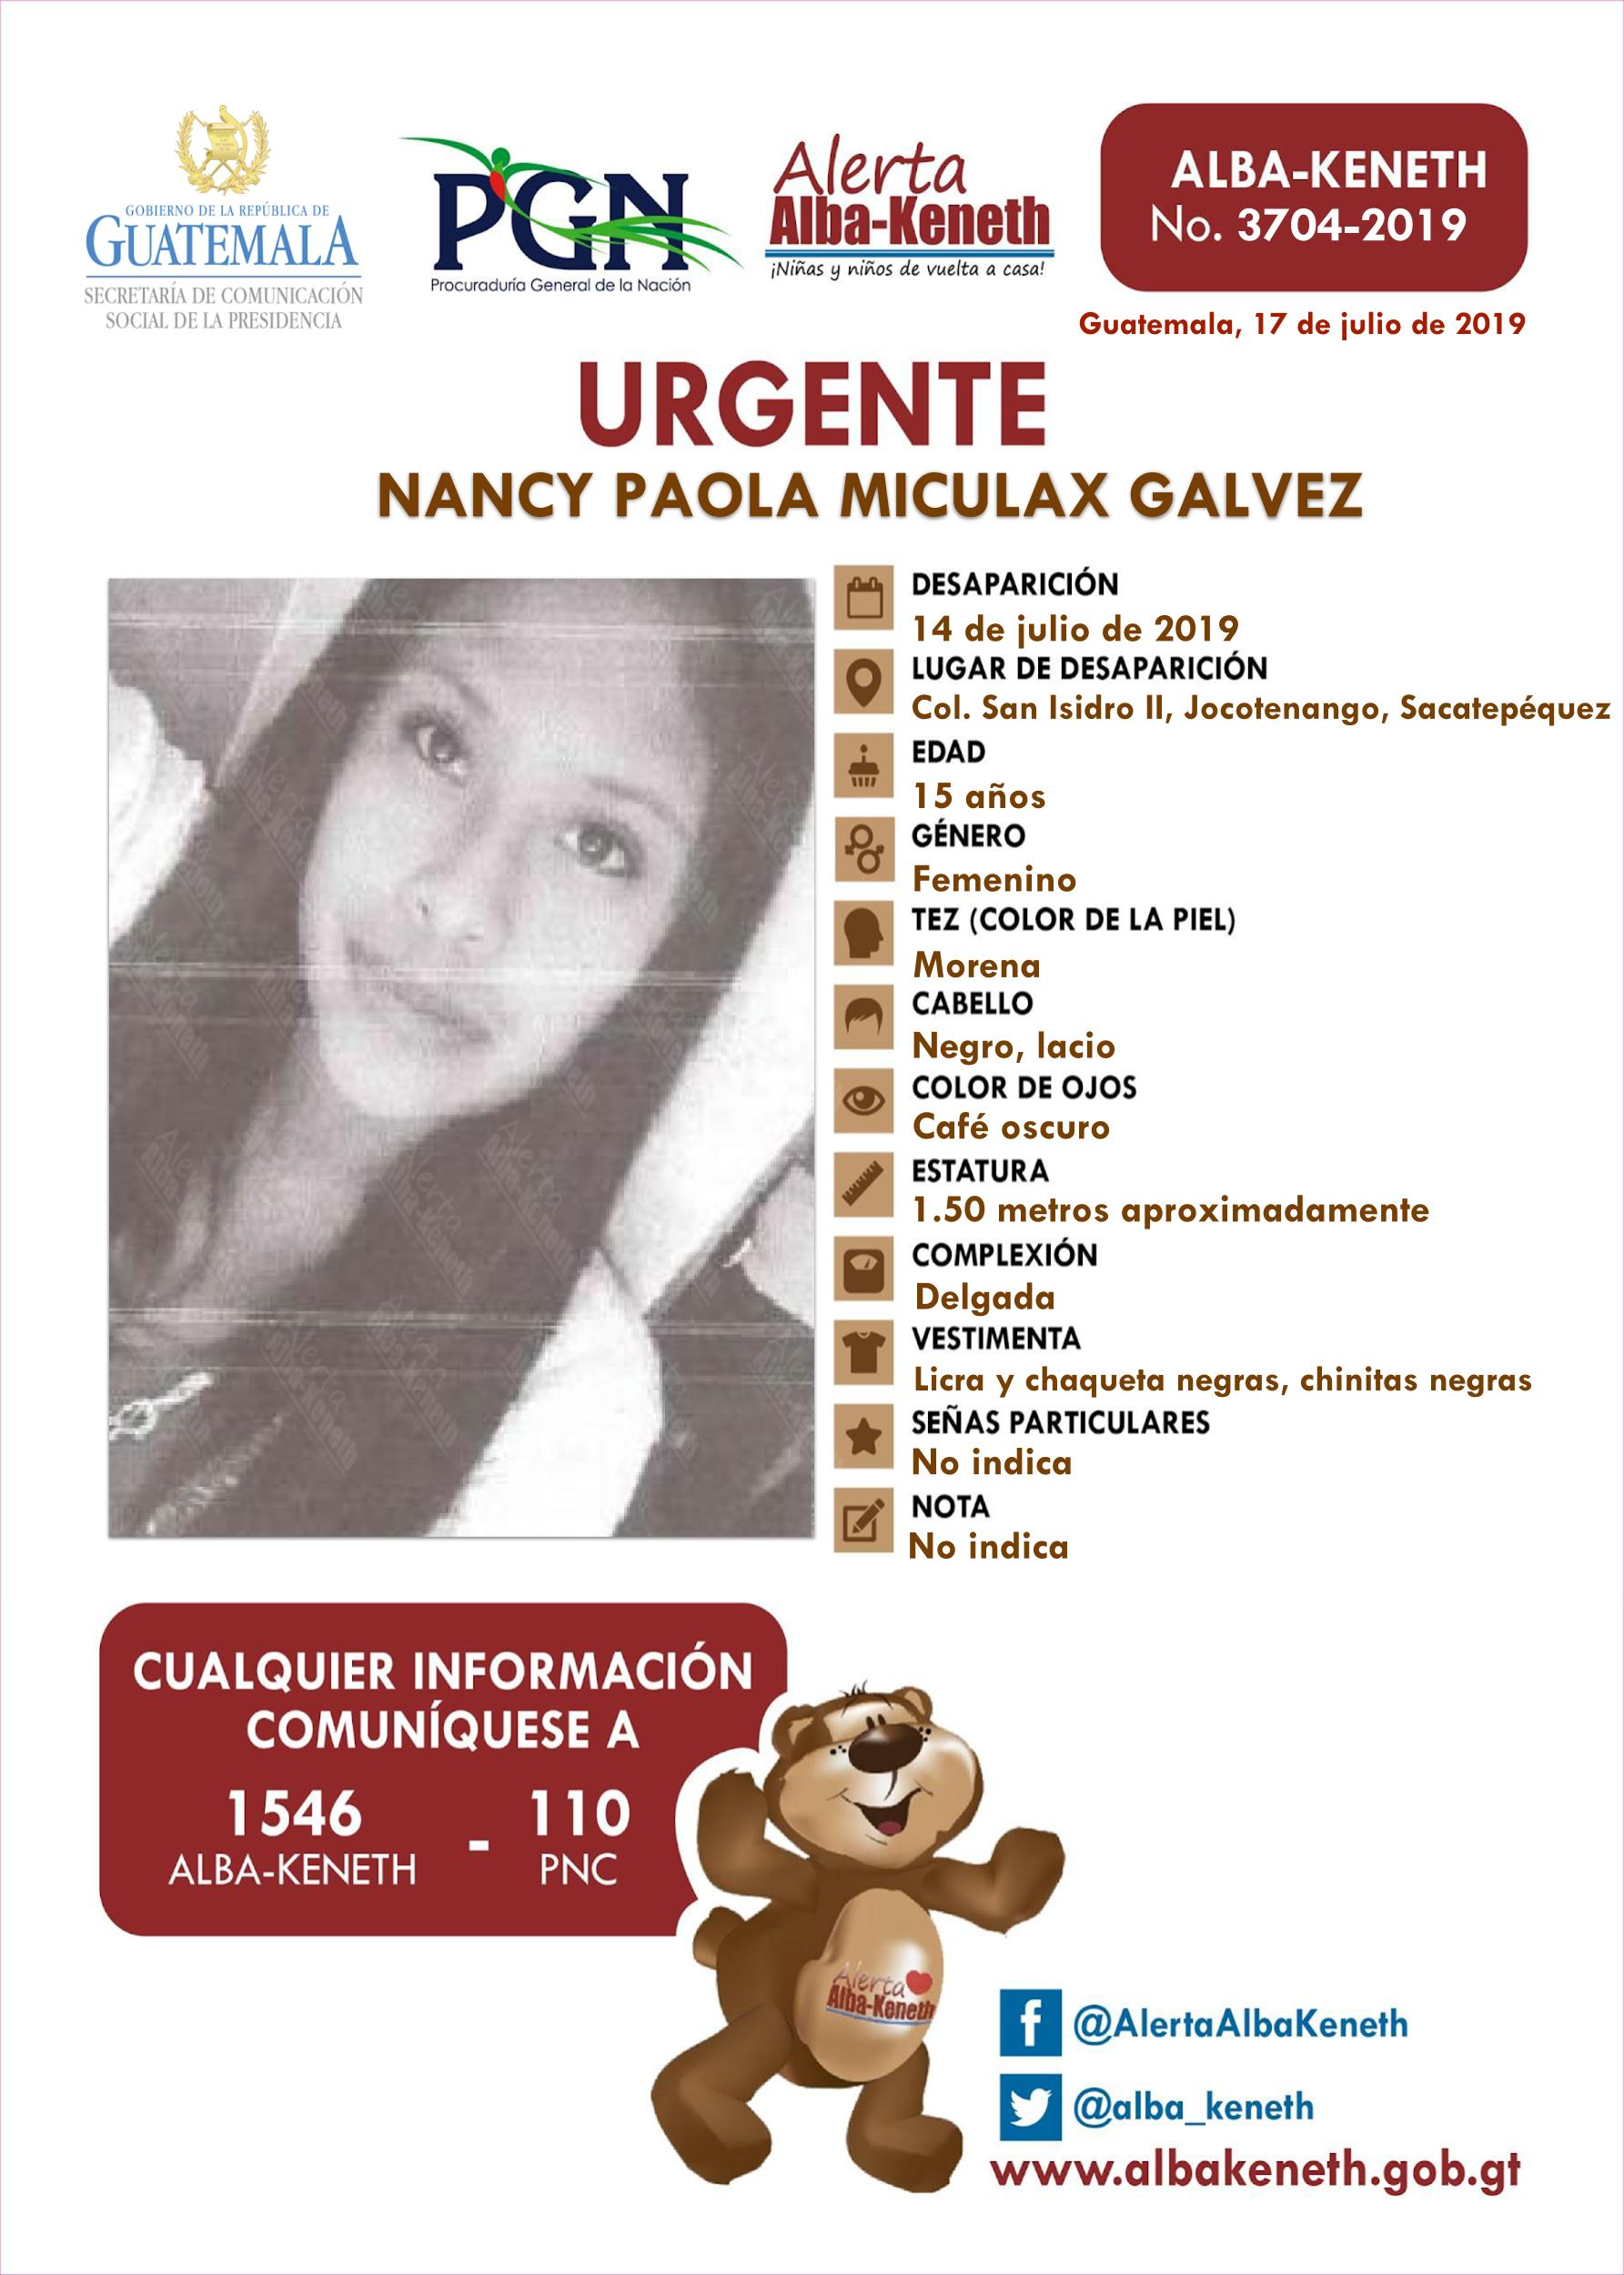 Nancy Paola Miculax Galvez